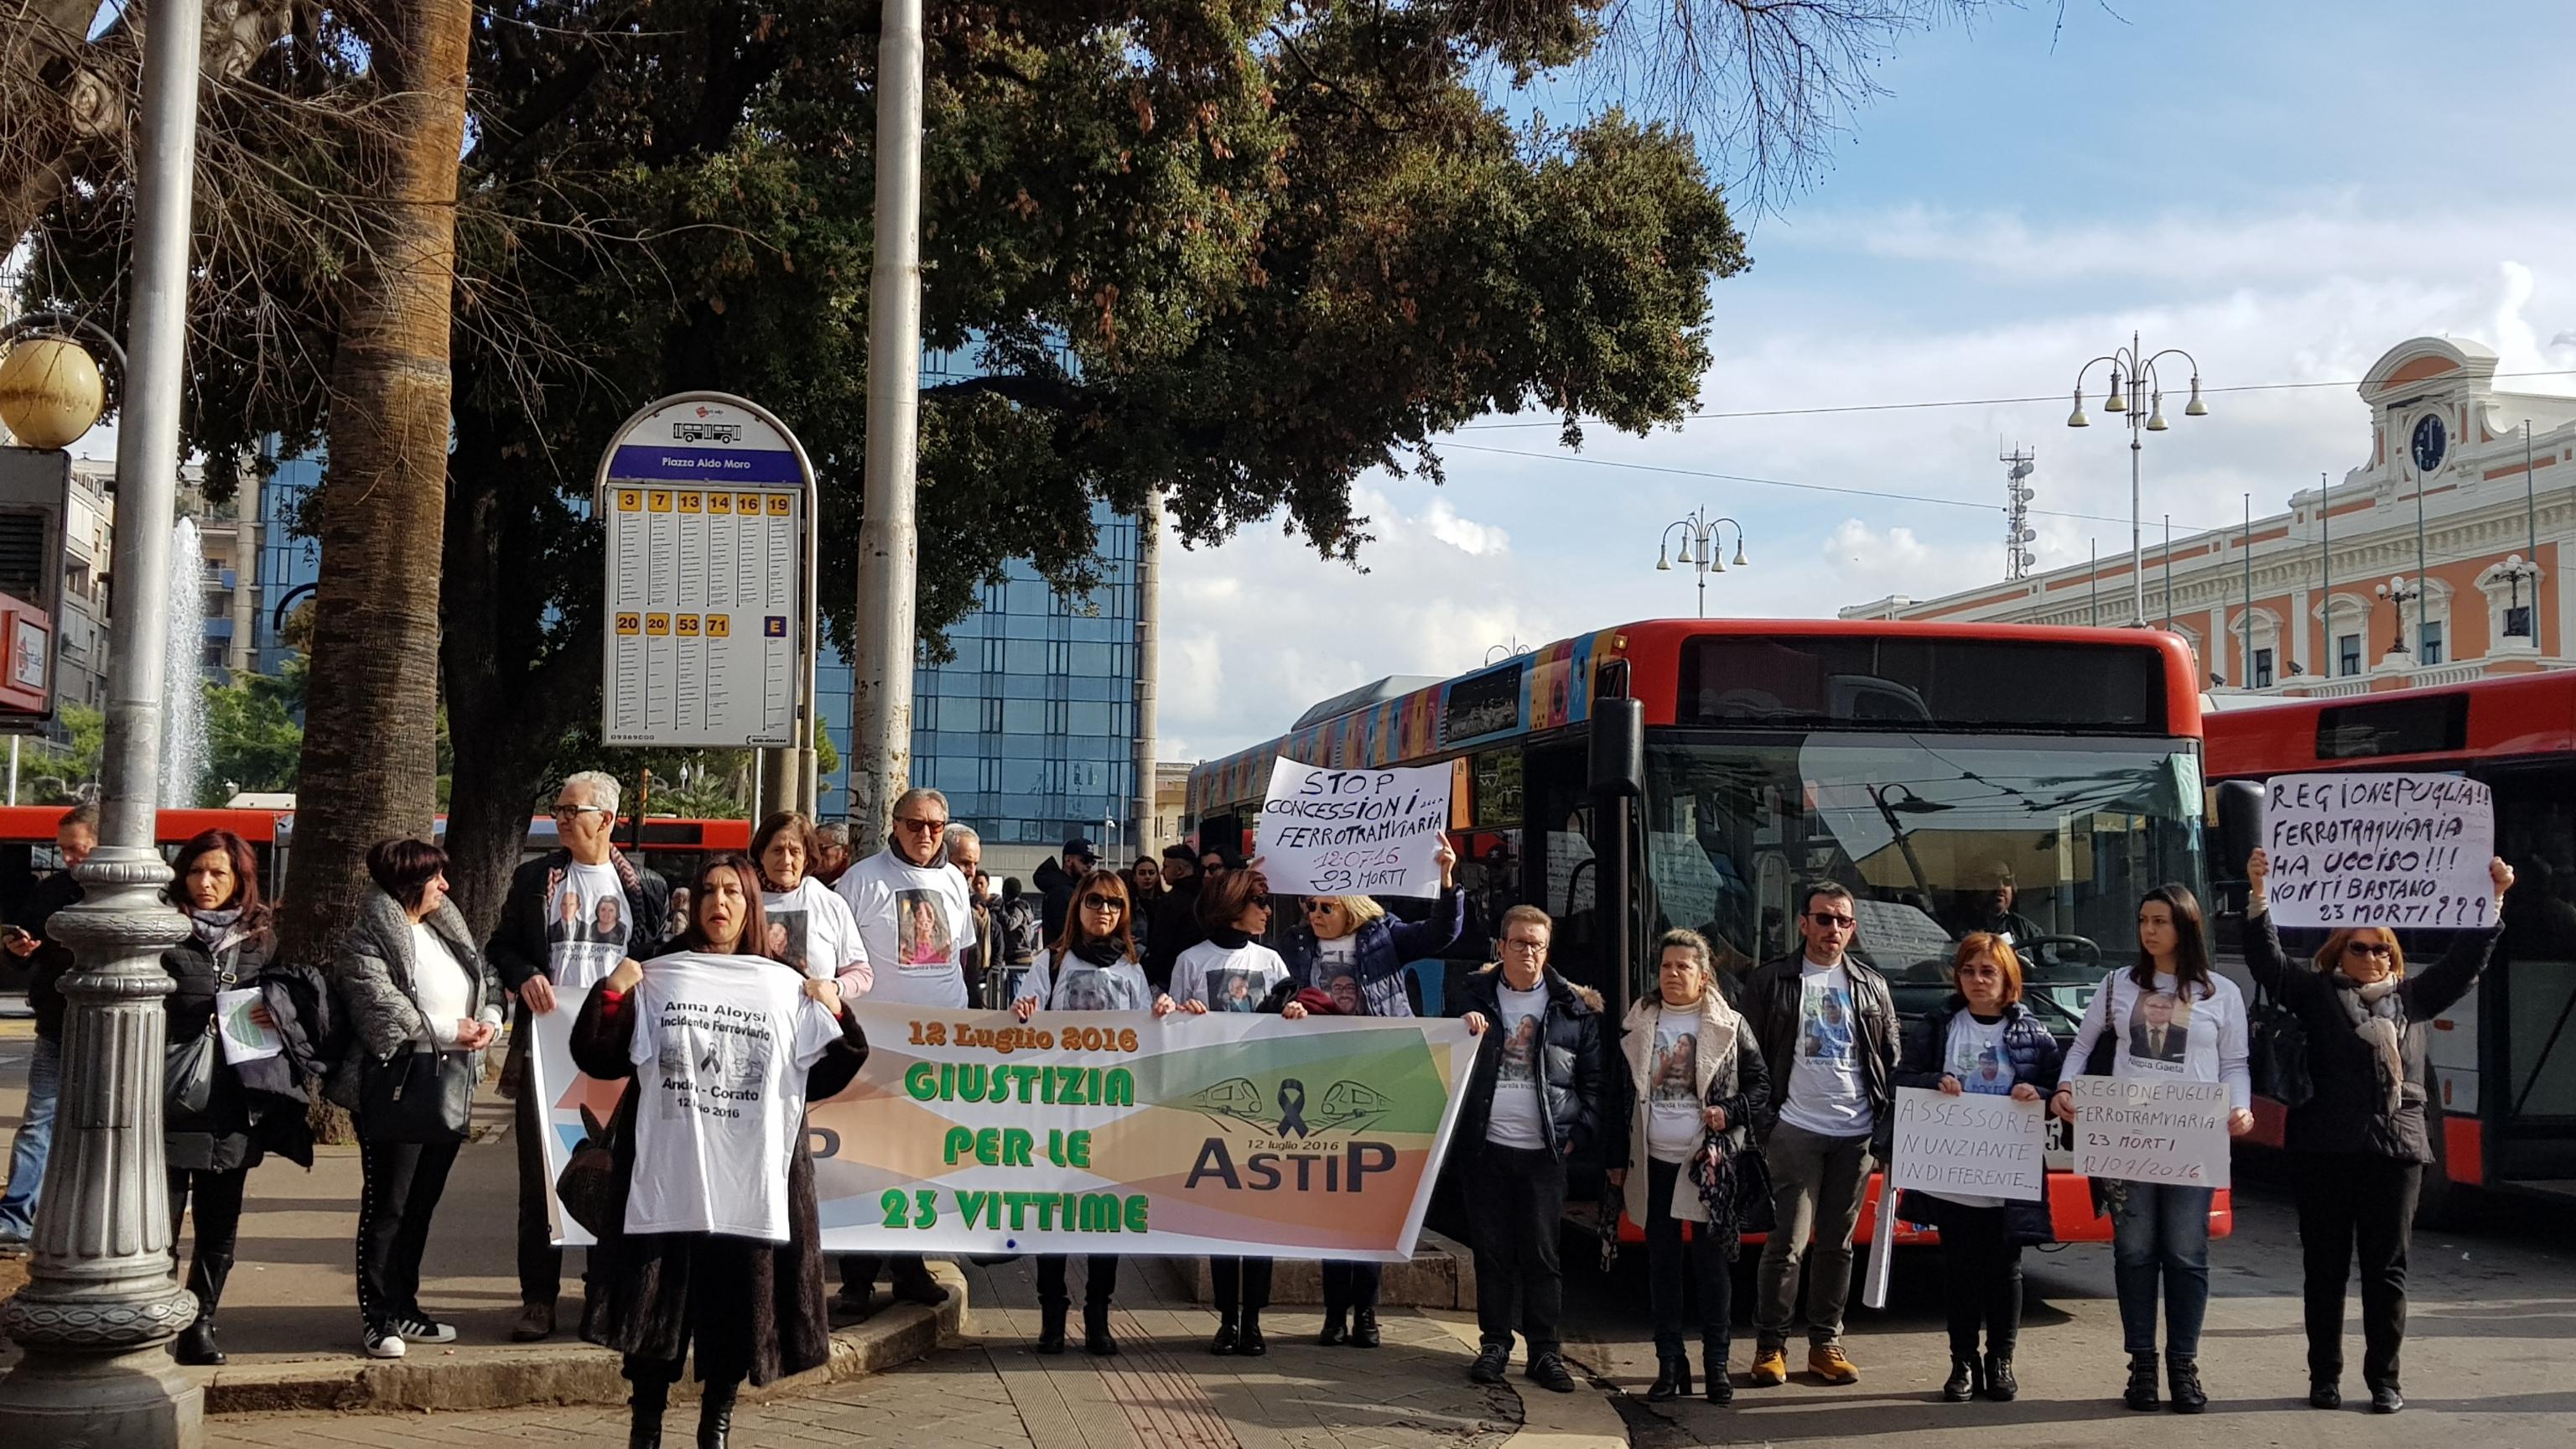 Scontro treni: protesta parenti vittime